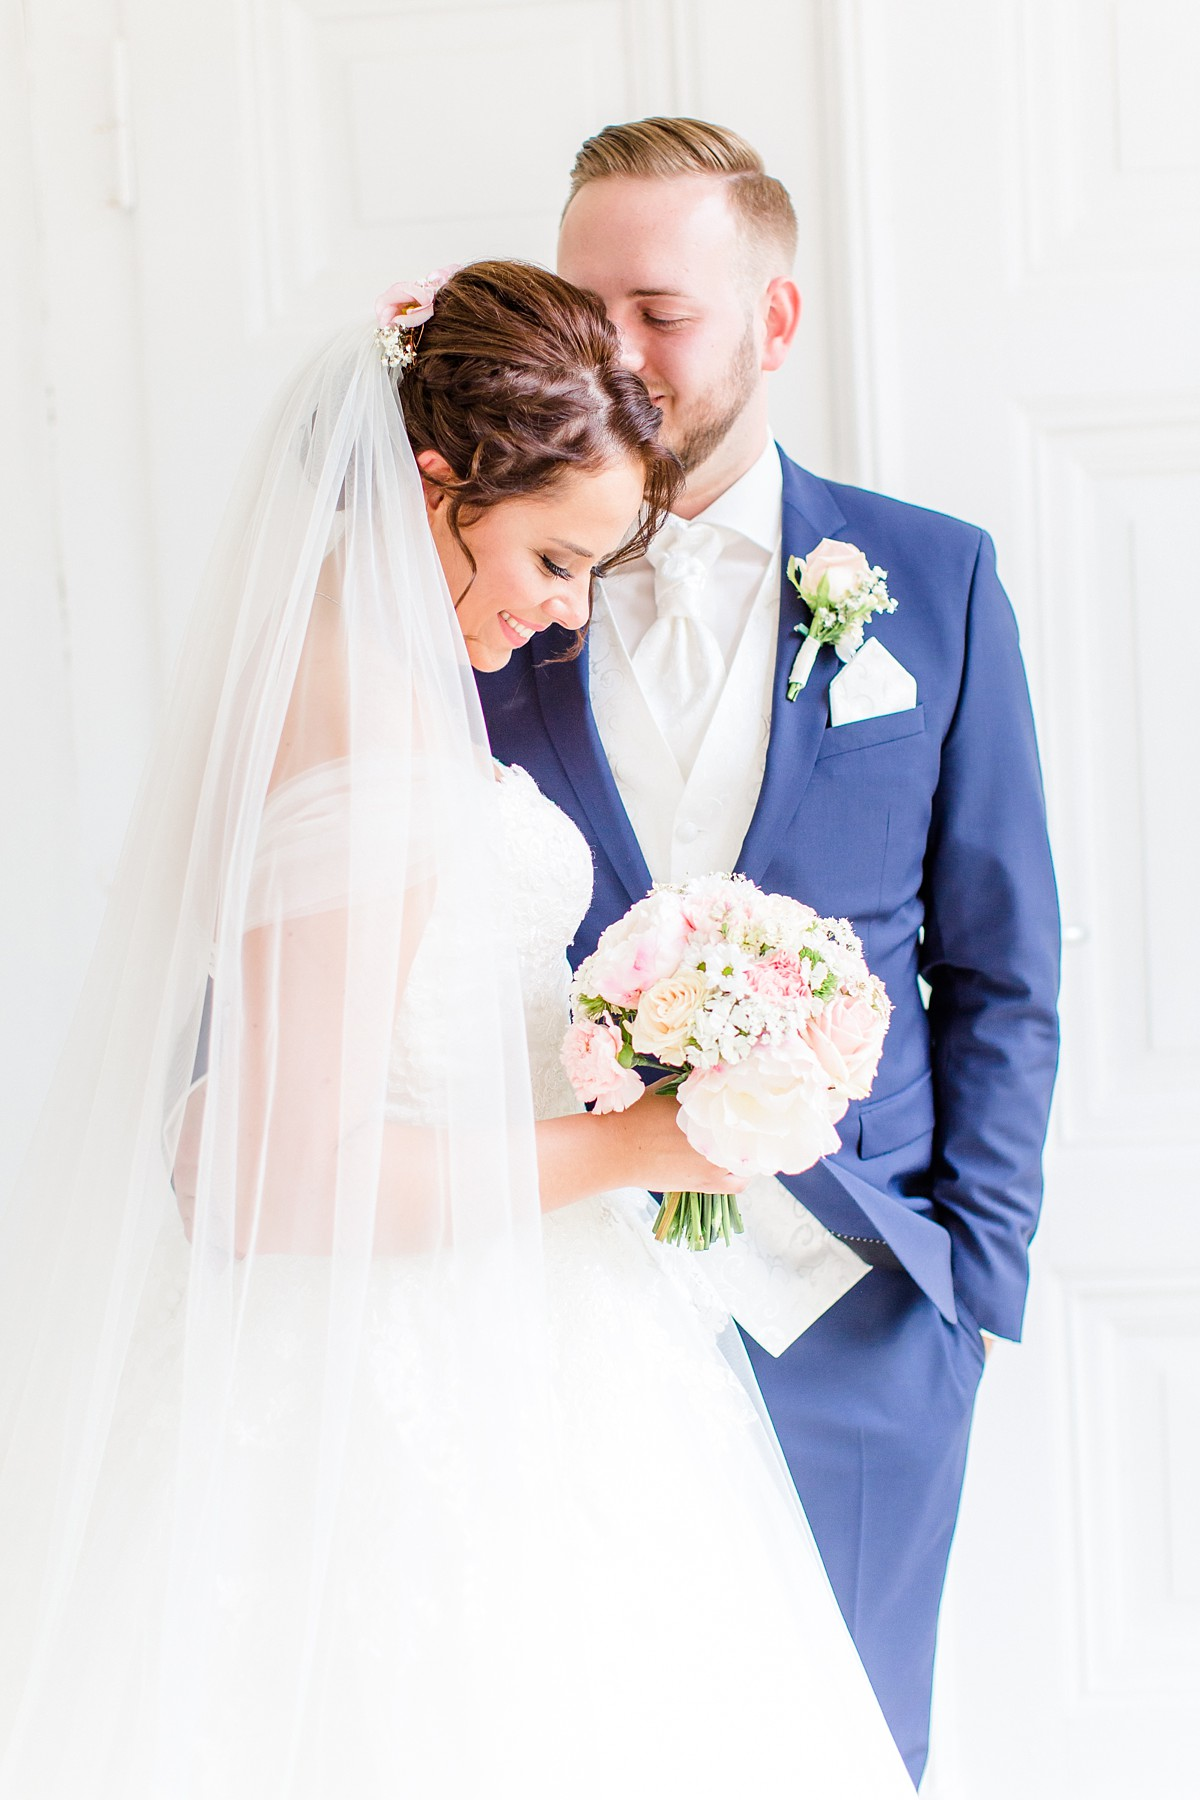 Hochzeitsfotograf-Bünde-Hücker-Moor-Fotograf-Moor-Ranch_0139